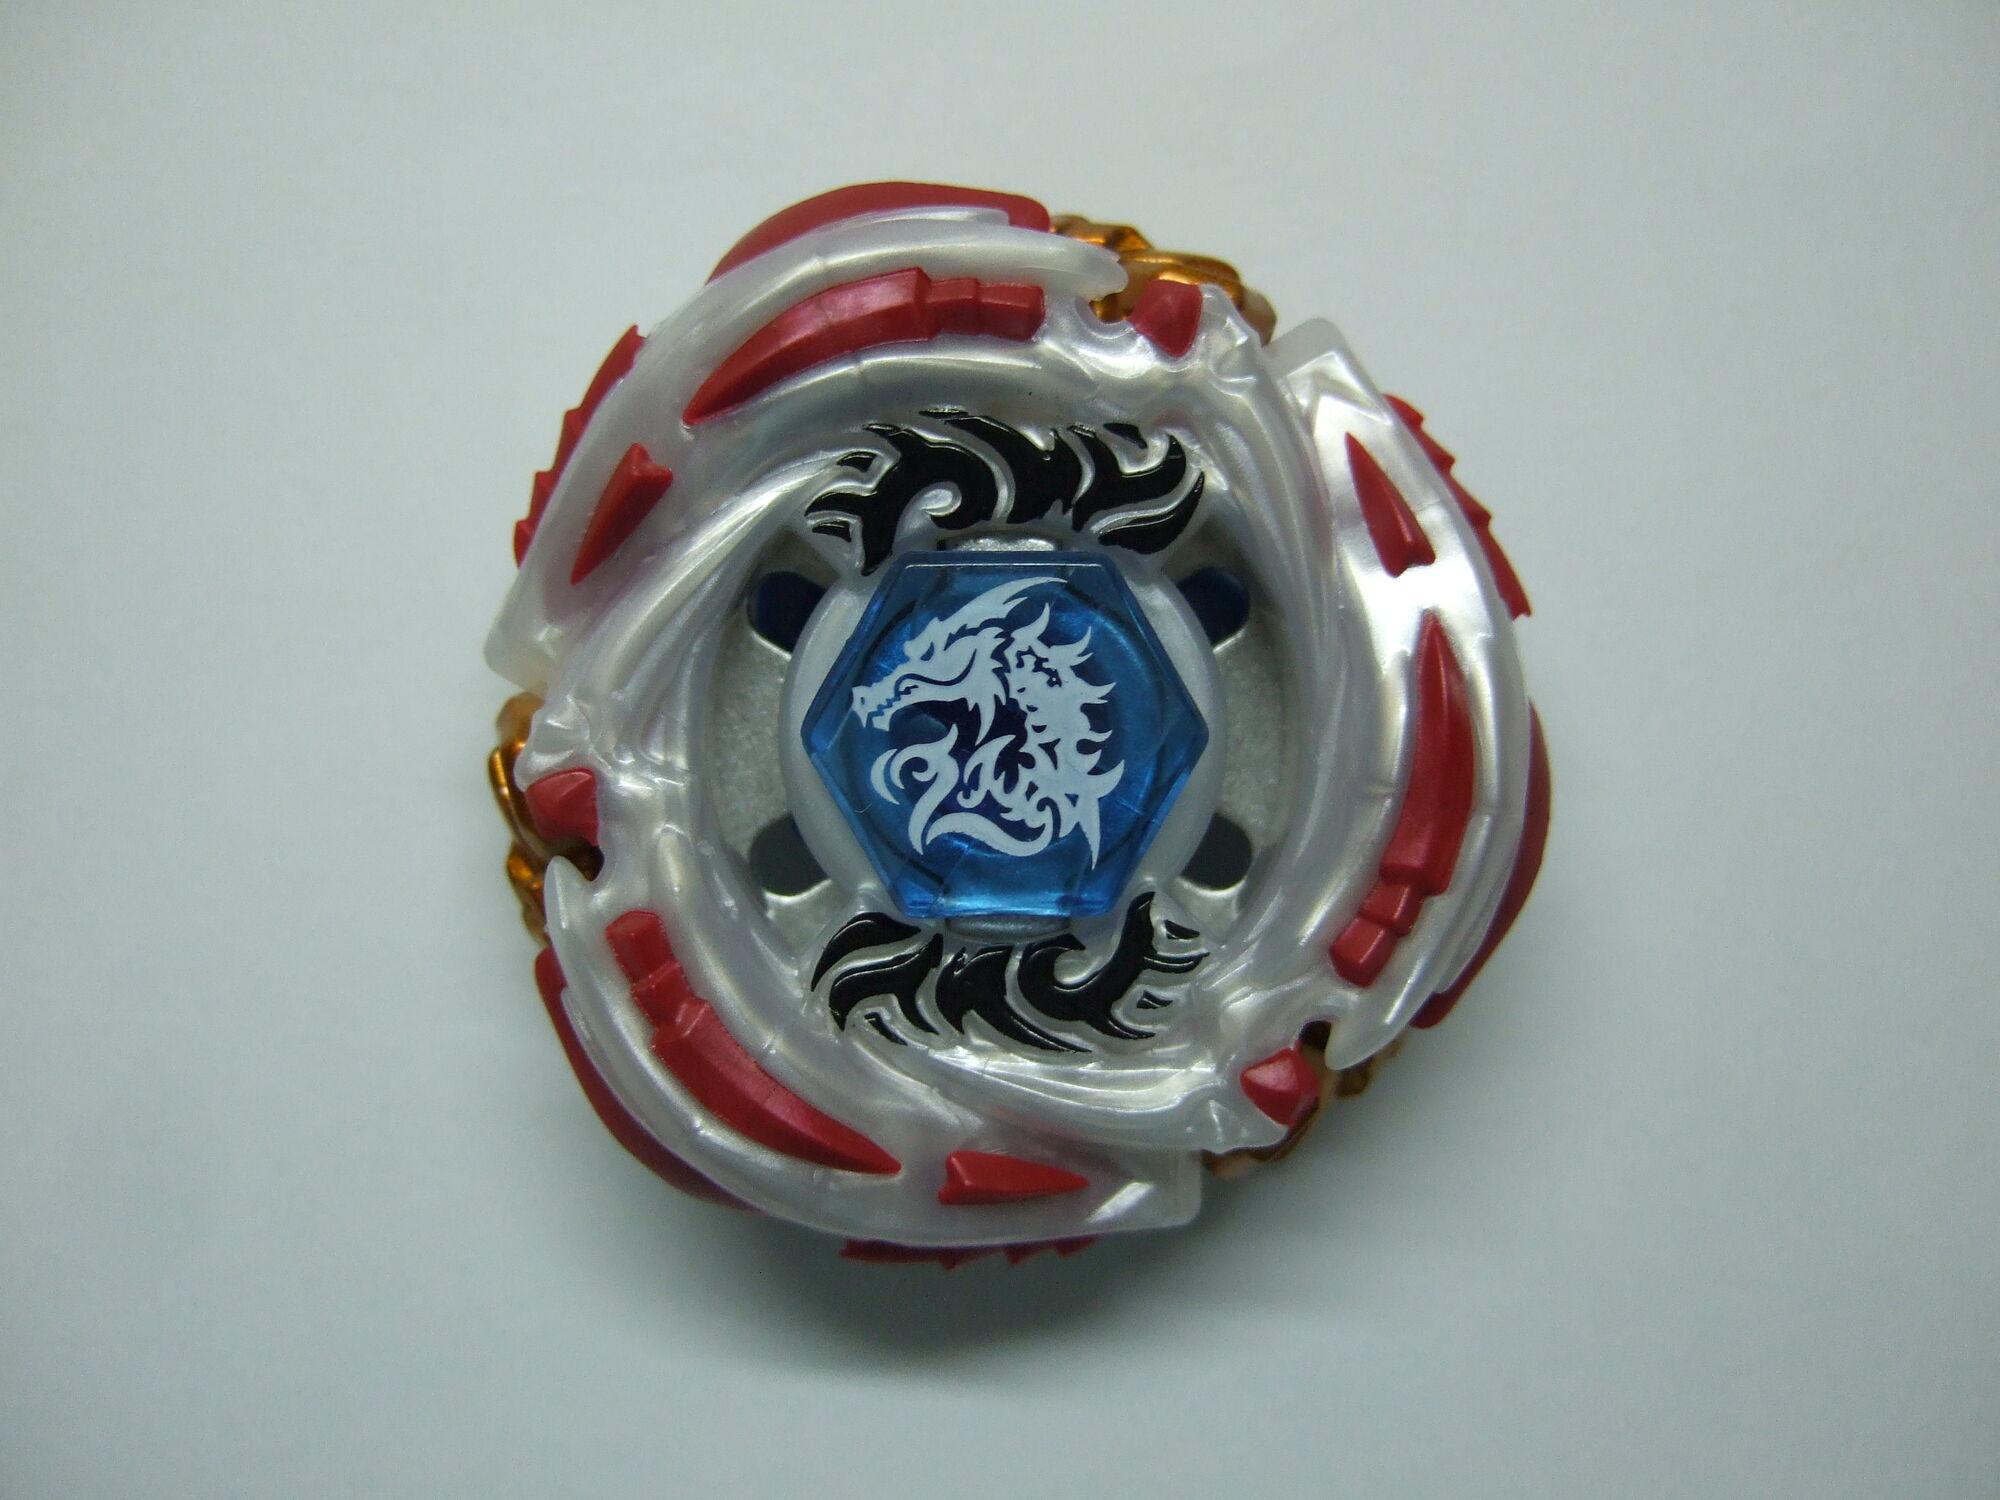 Image - Meteo L'drago.jpg | Beyblade Wiki | FANDOM powered ...